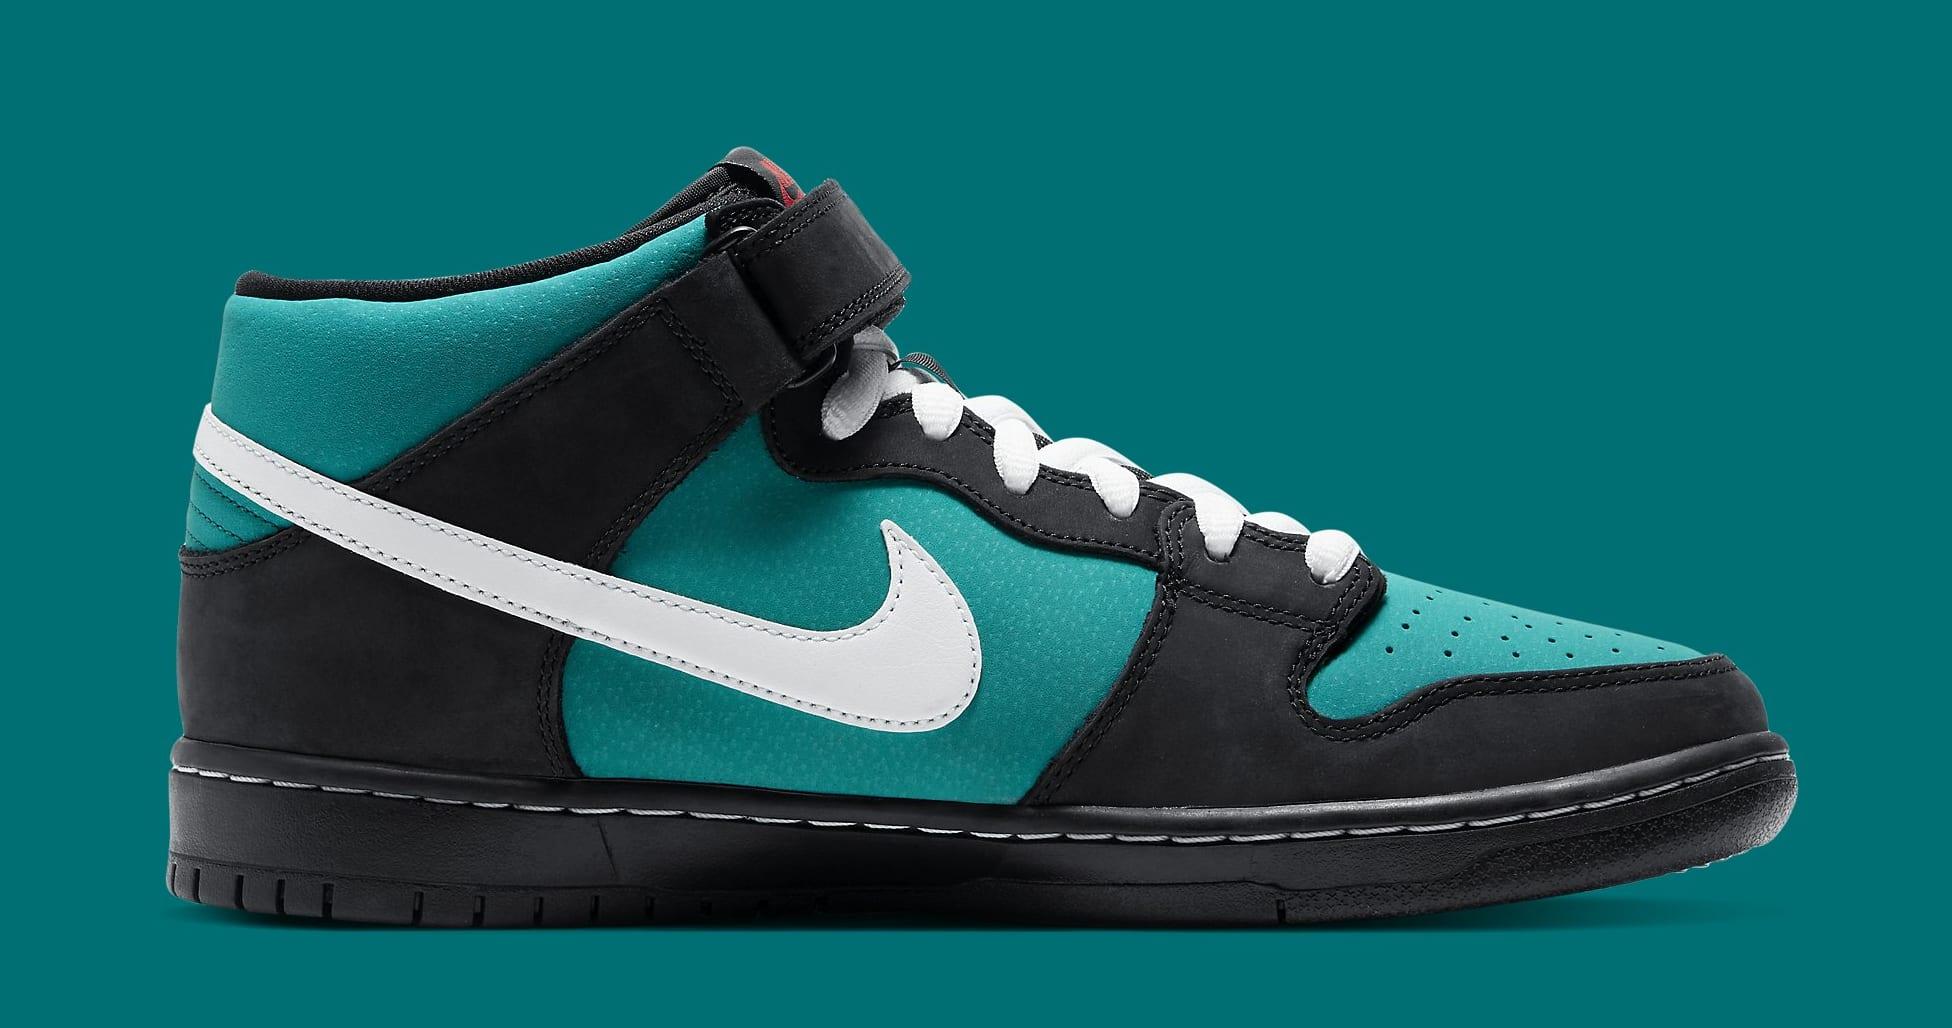 Nike SB Dunk Mid 'Griffey Jr.' CV5474-001 Medial